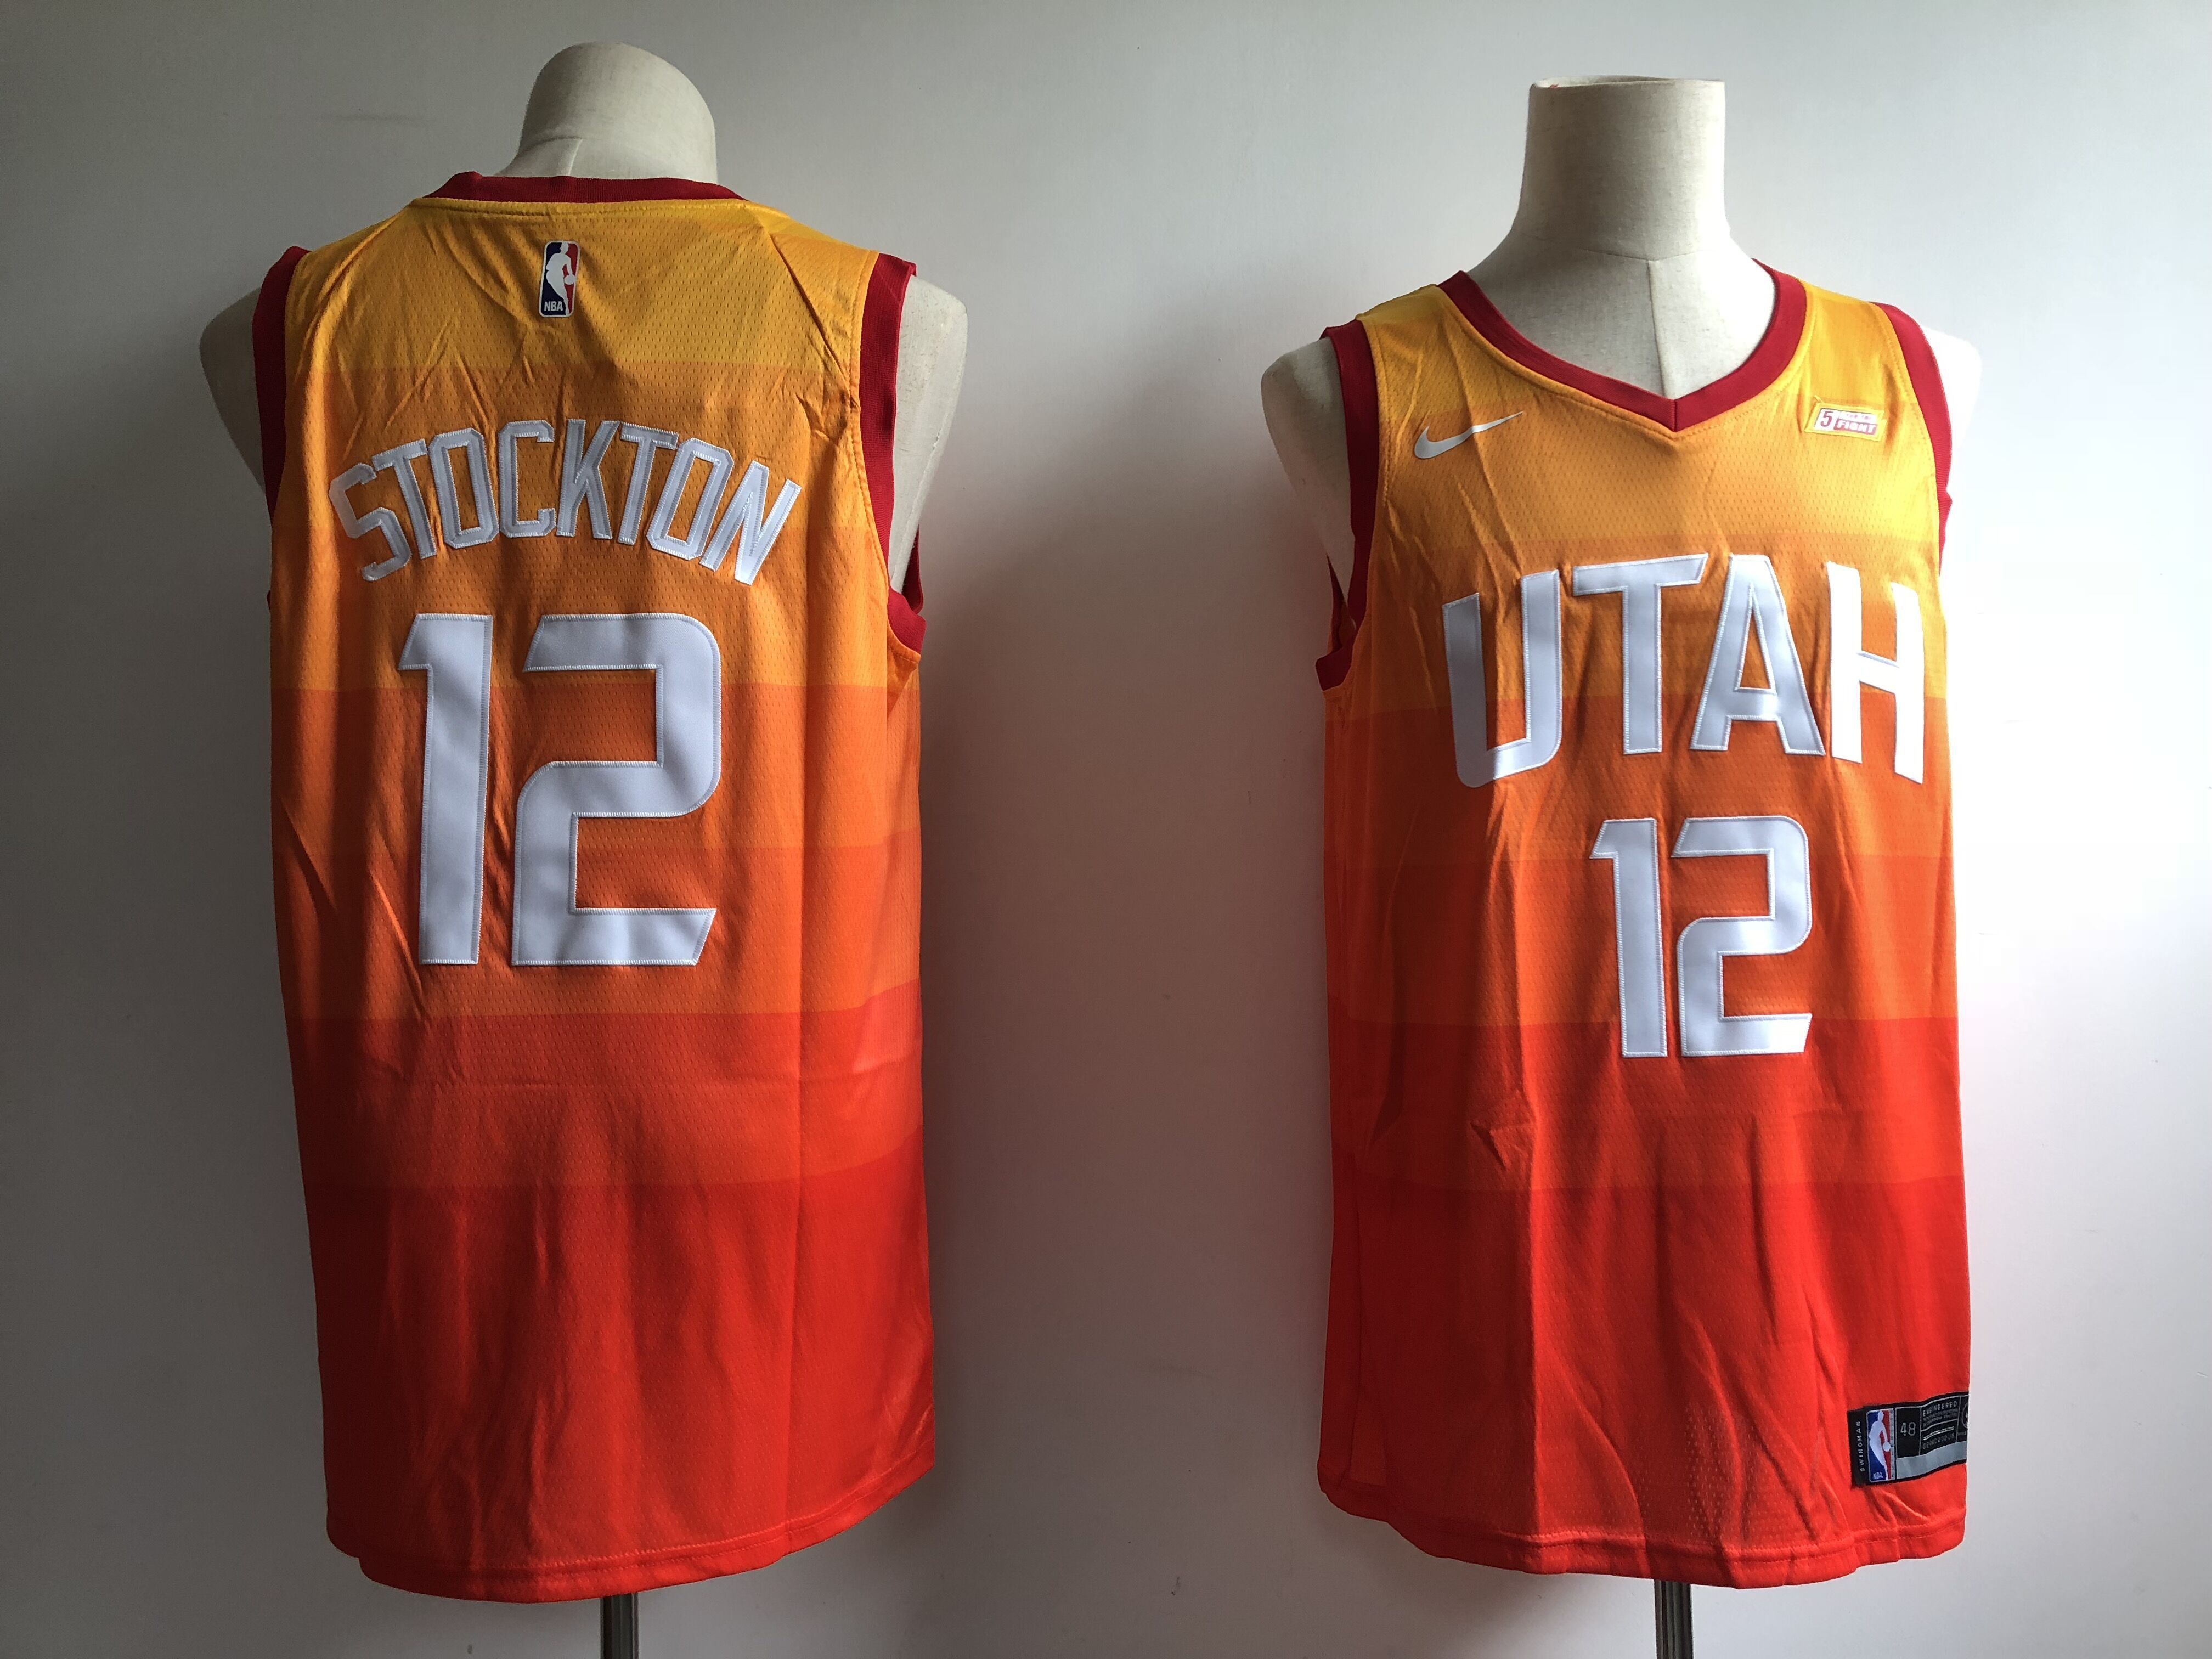 e13974bd441 Men Utah Jazz 12 Stockton Orange City Edition Game Nike NBA Jerseys